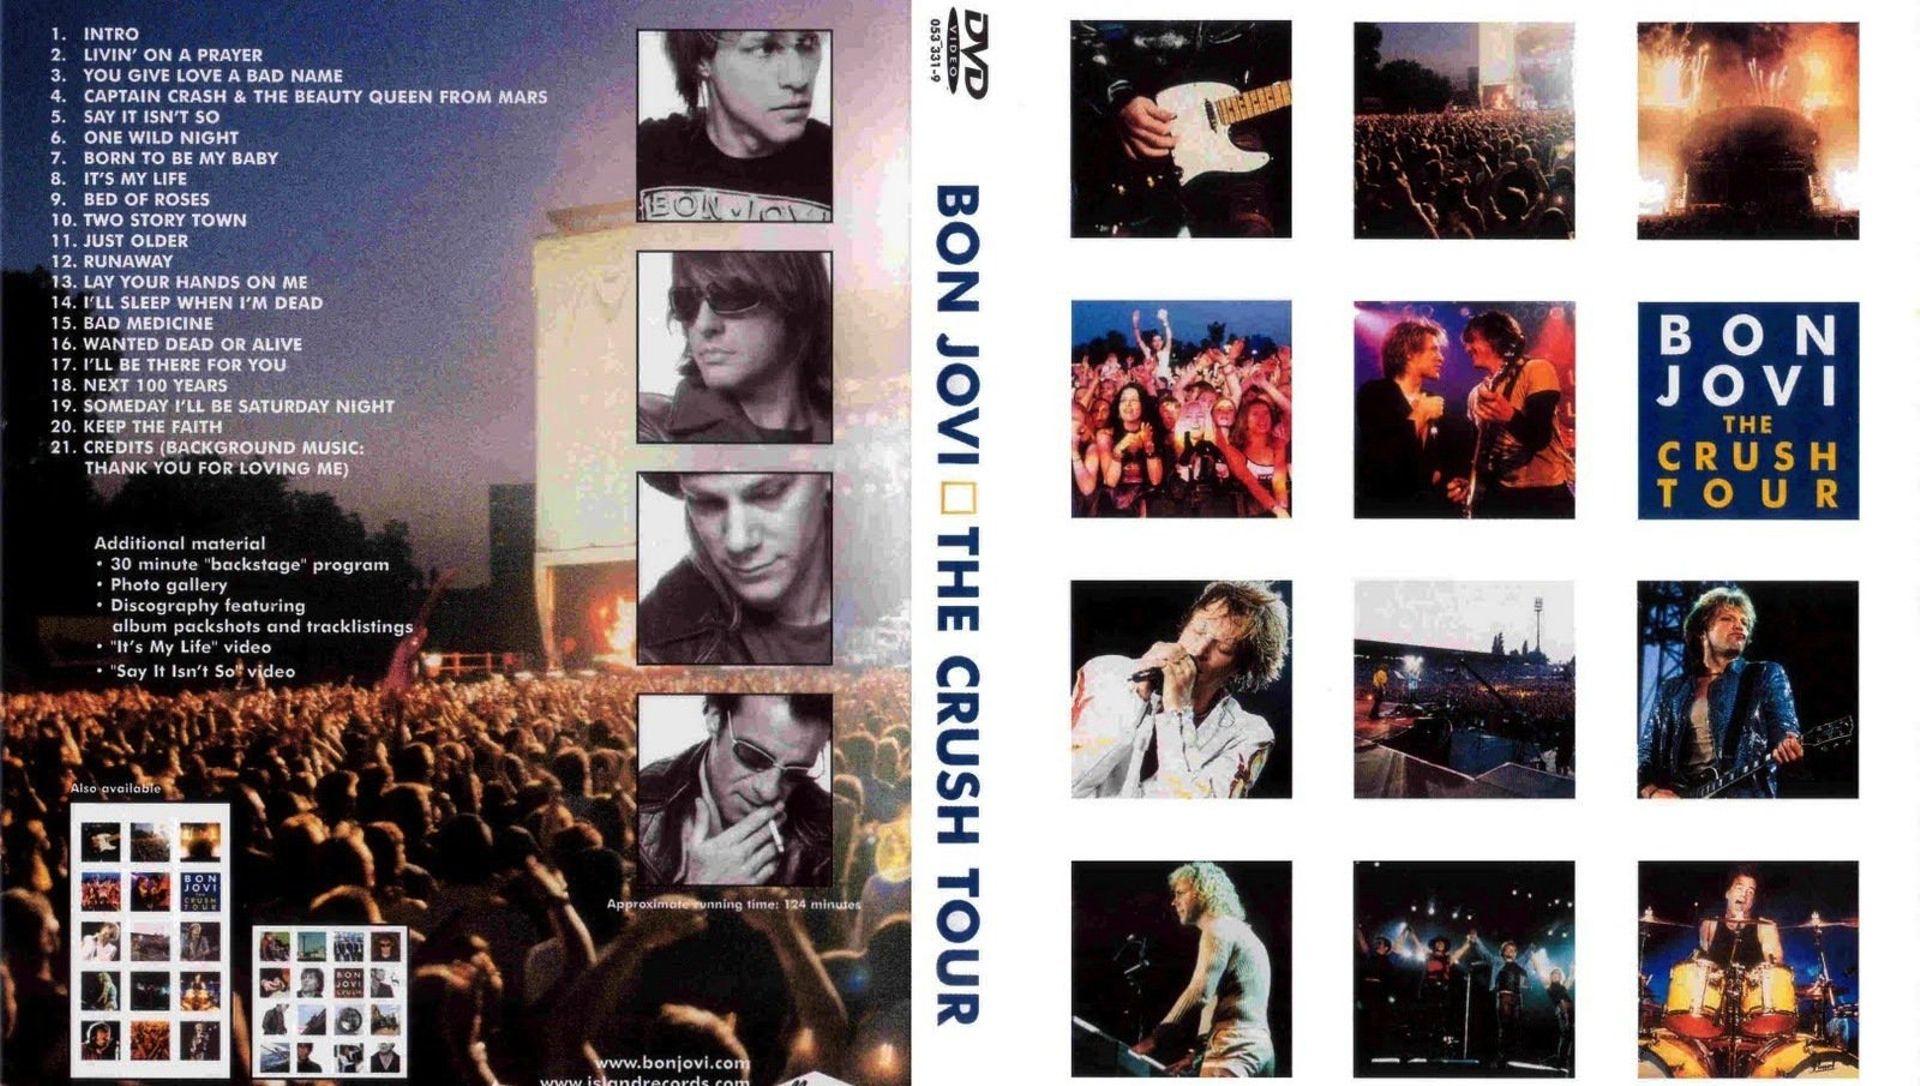 Bon Jovi: The Crush Tour (2000) - Where to Watch It